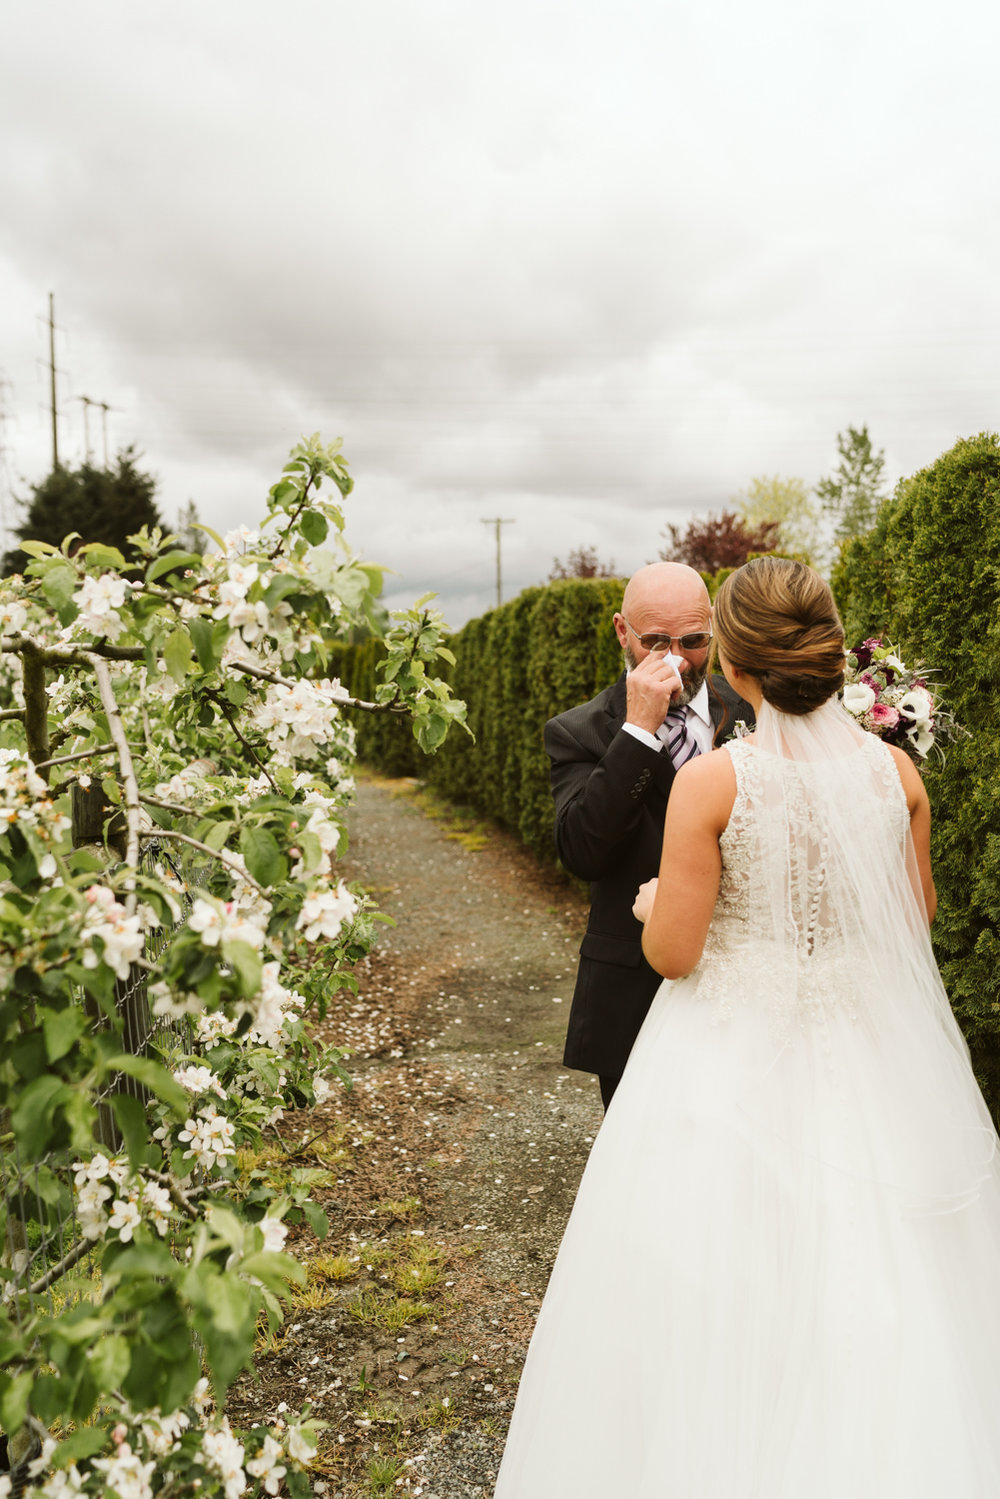 April Yentas Photography - jen and anthony wedding-25.jpg